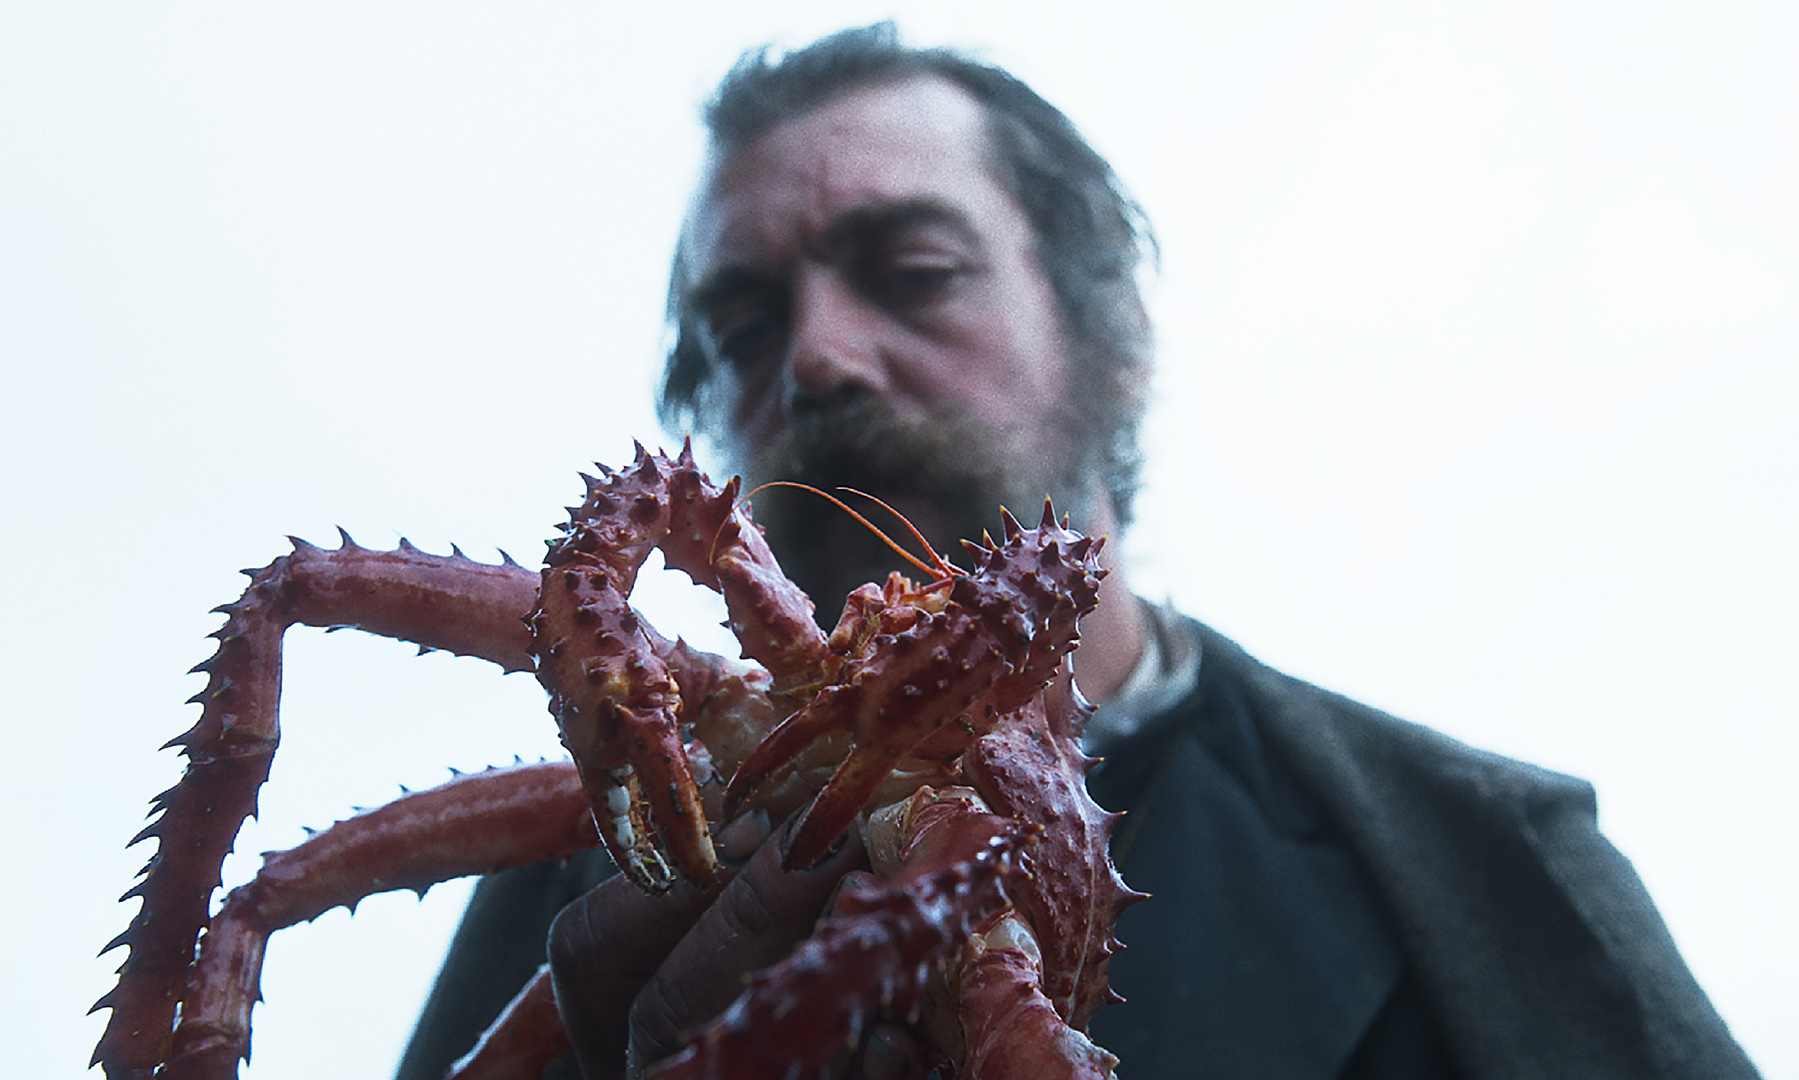 The Tale of King Crab (Alessio Rigo de Righi and Matteo Zoppis)